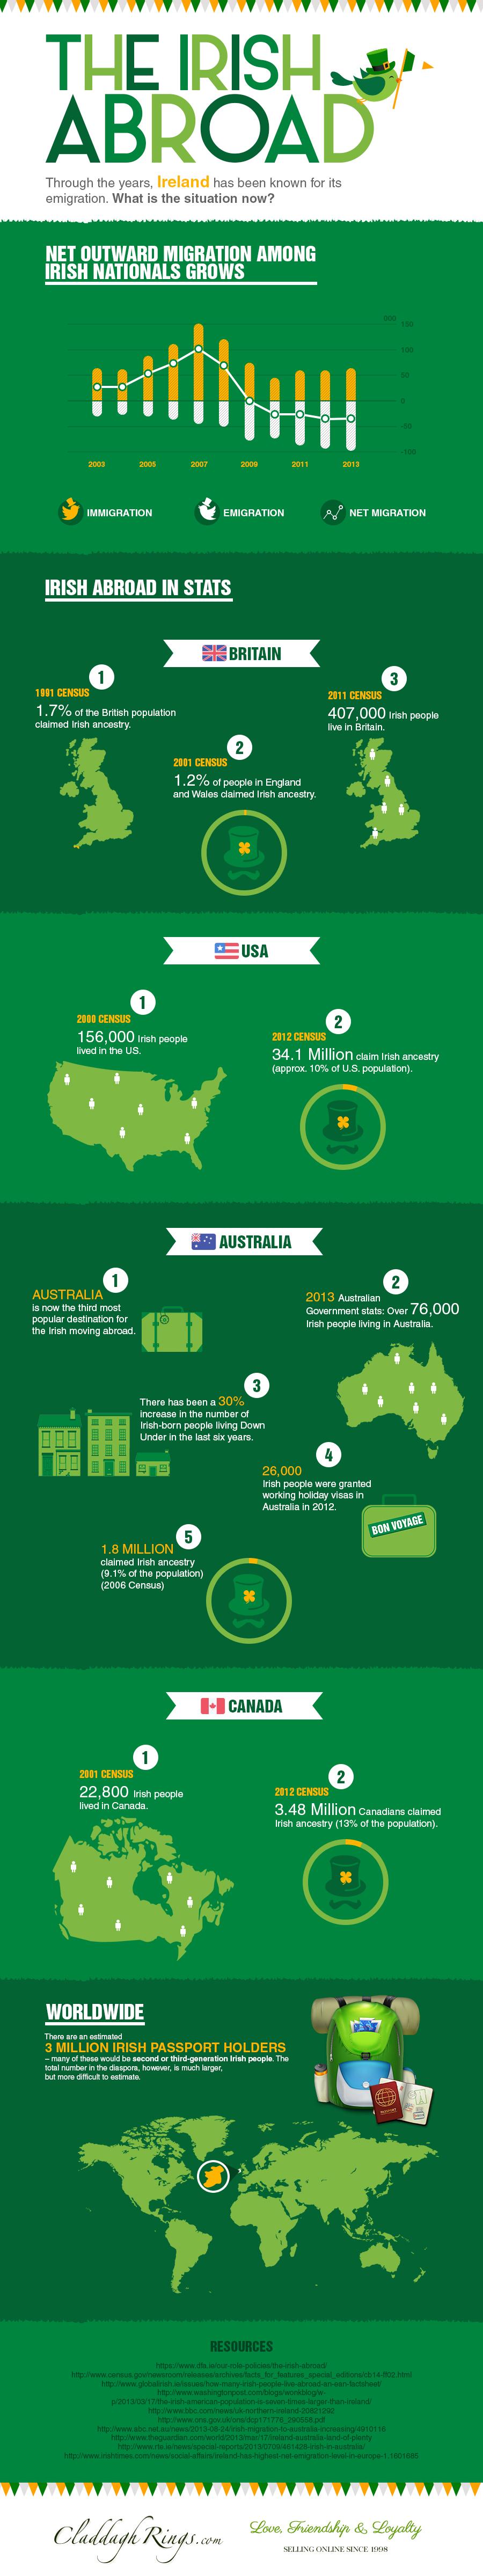 The Irish Abroad Infographic